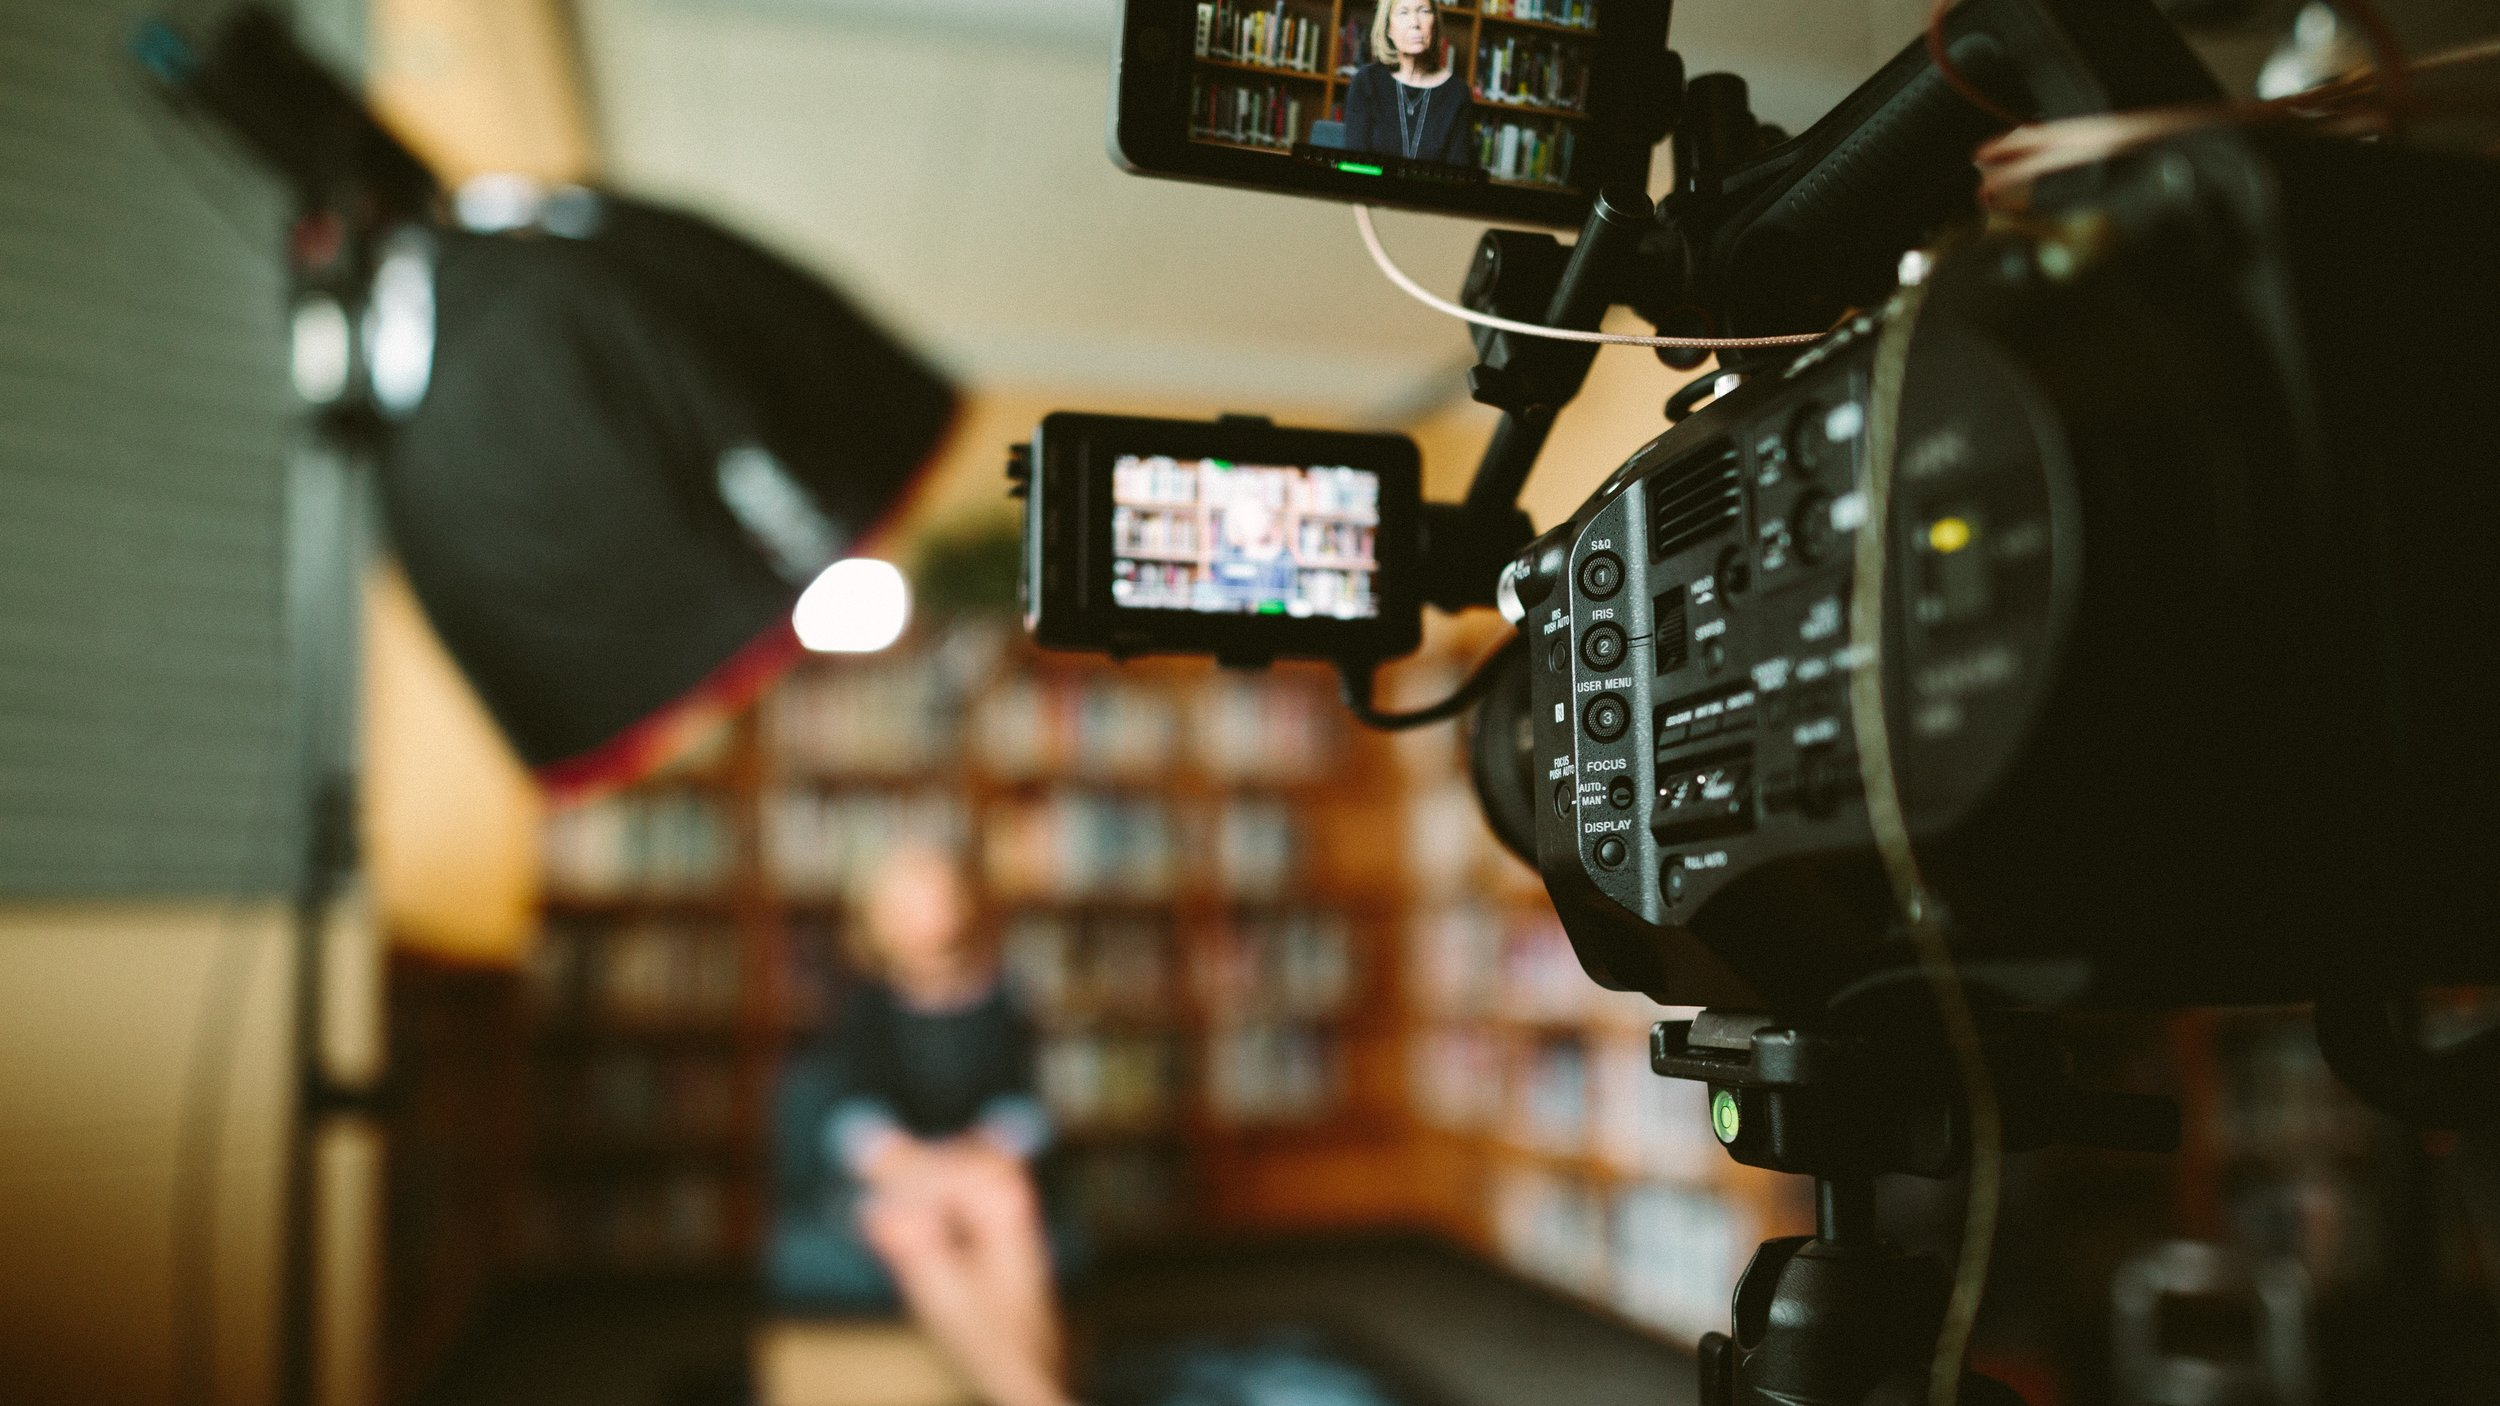 Media Coverage - TV, Radio, Articles & More